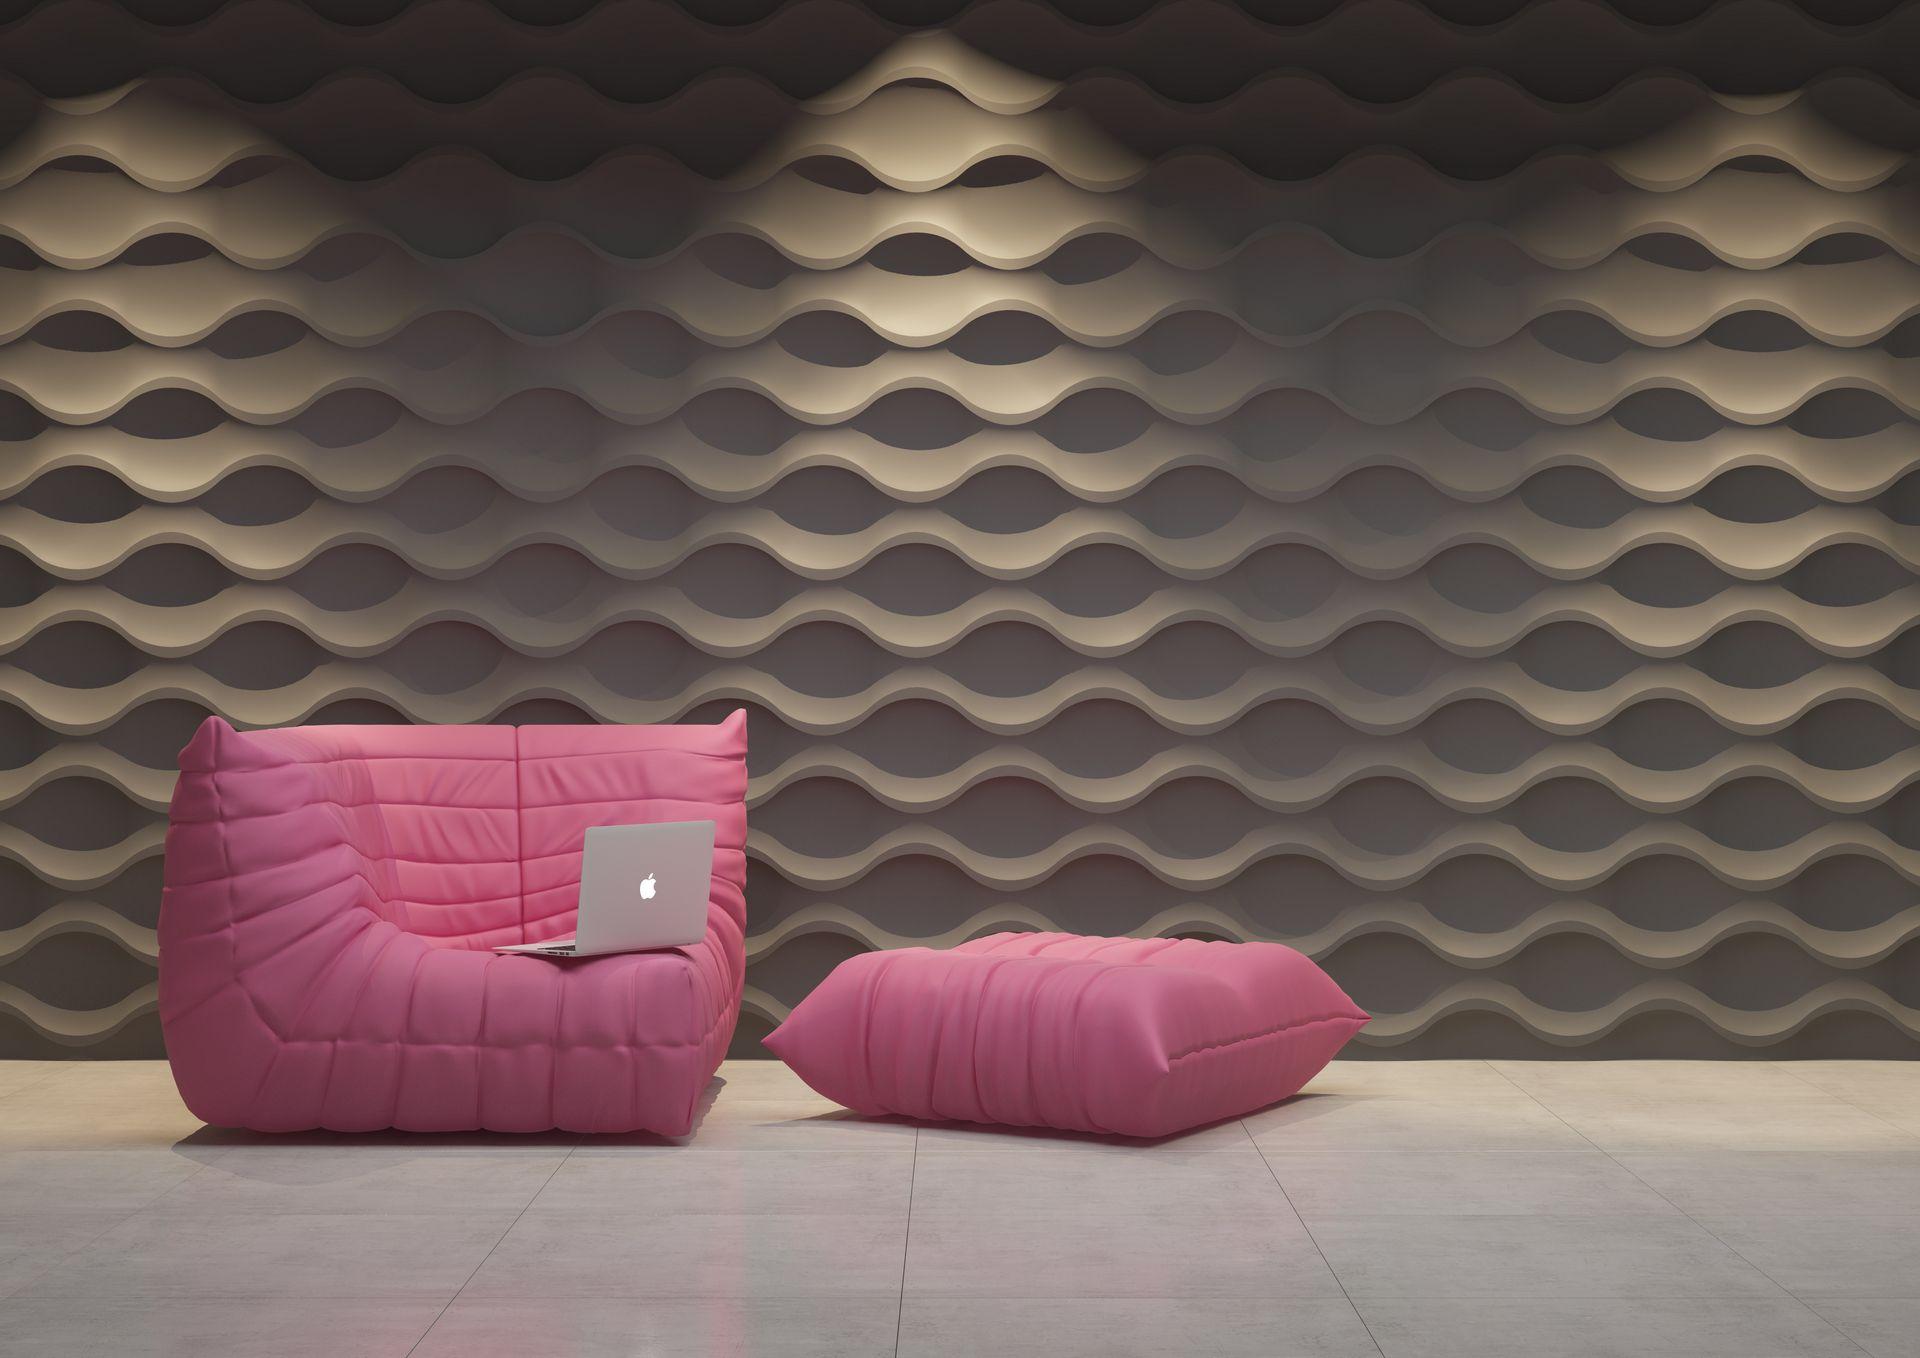 Wzornictwo Panele Dekoracyjne 3d Dunes